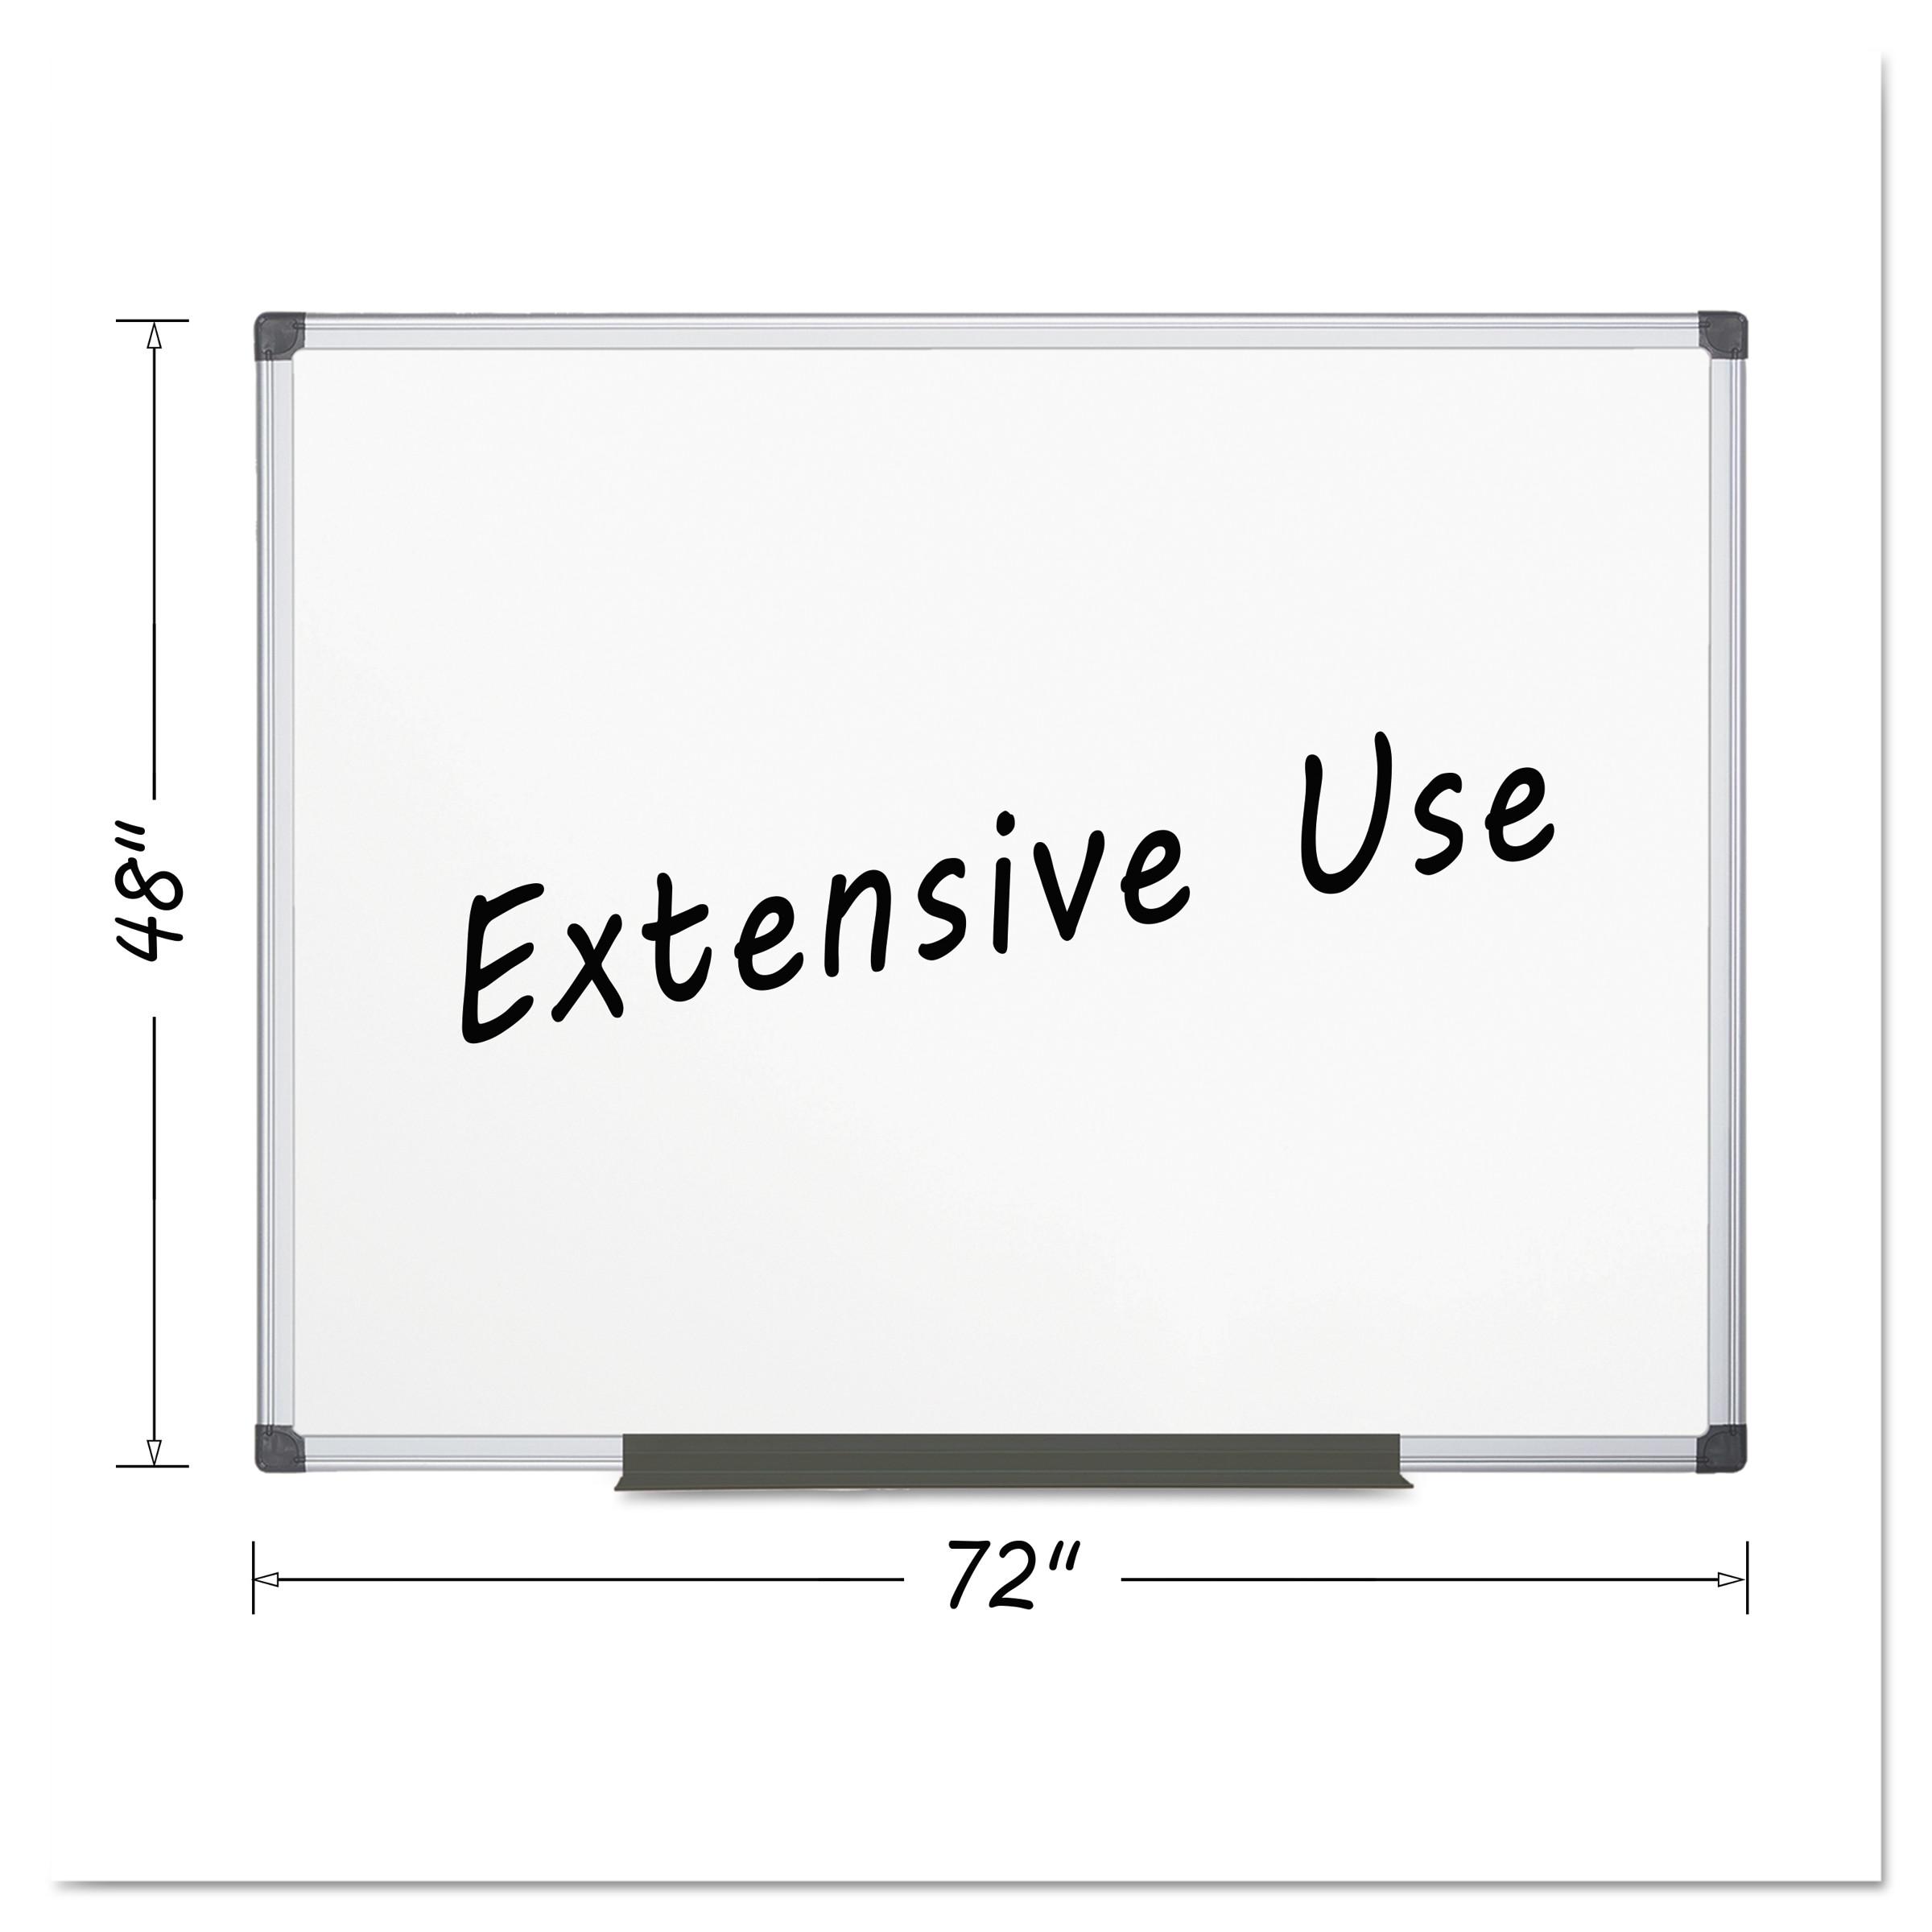 MasterVision Porcelain Value Dry Erase Board, 48 x 72, White, Aluminum Frame